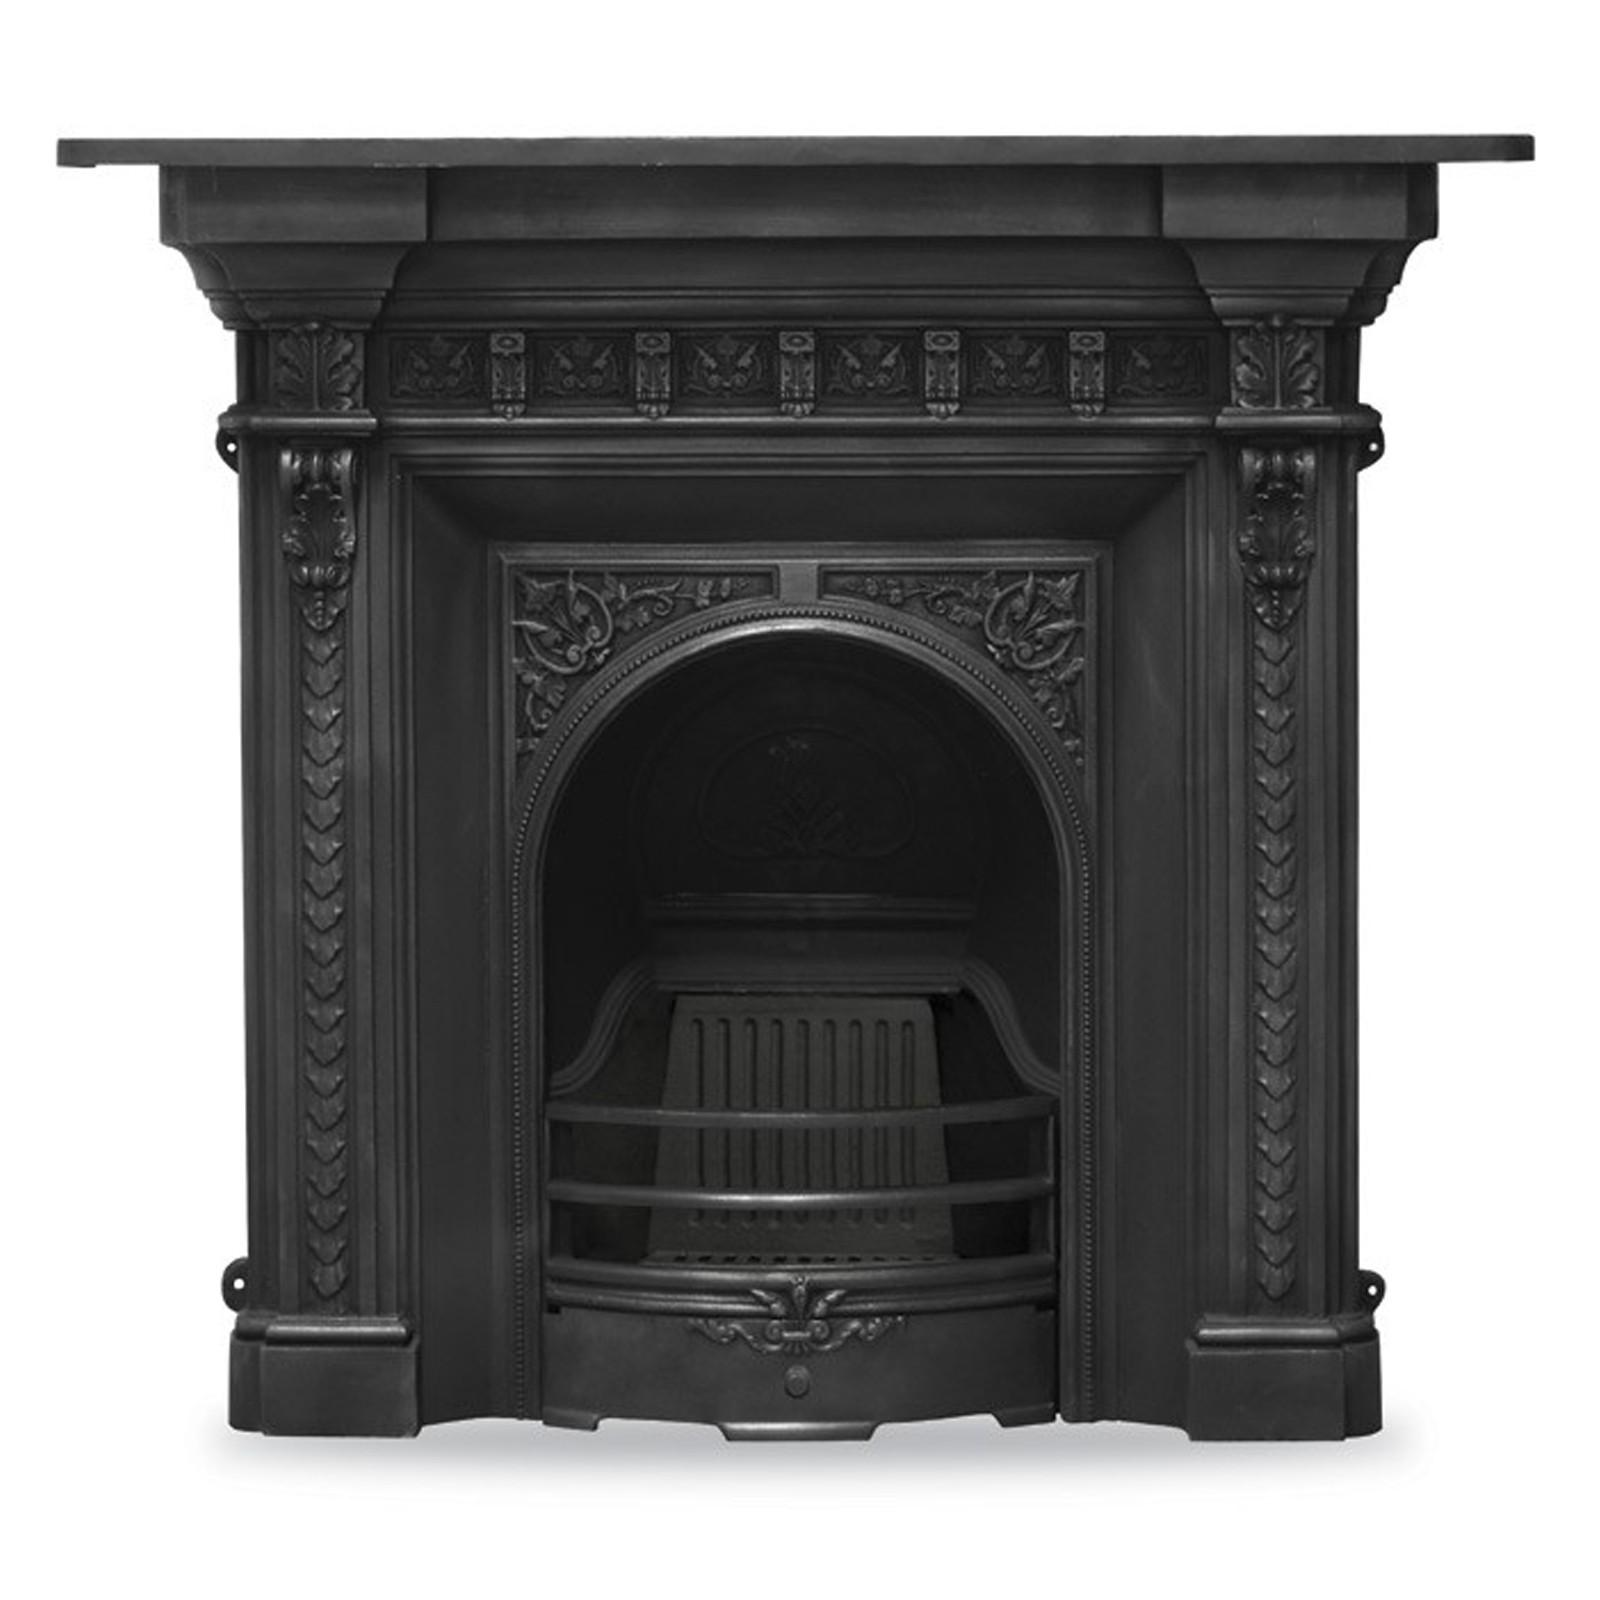 Victorian Fireplace: Carron Melrose Combination Cast Iron